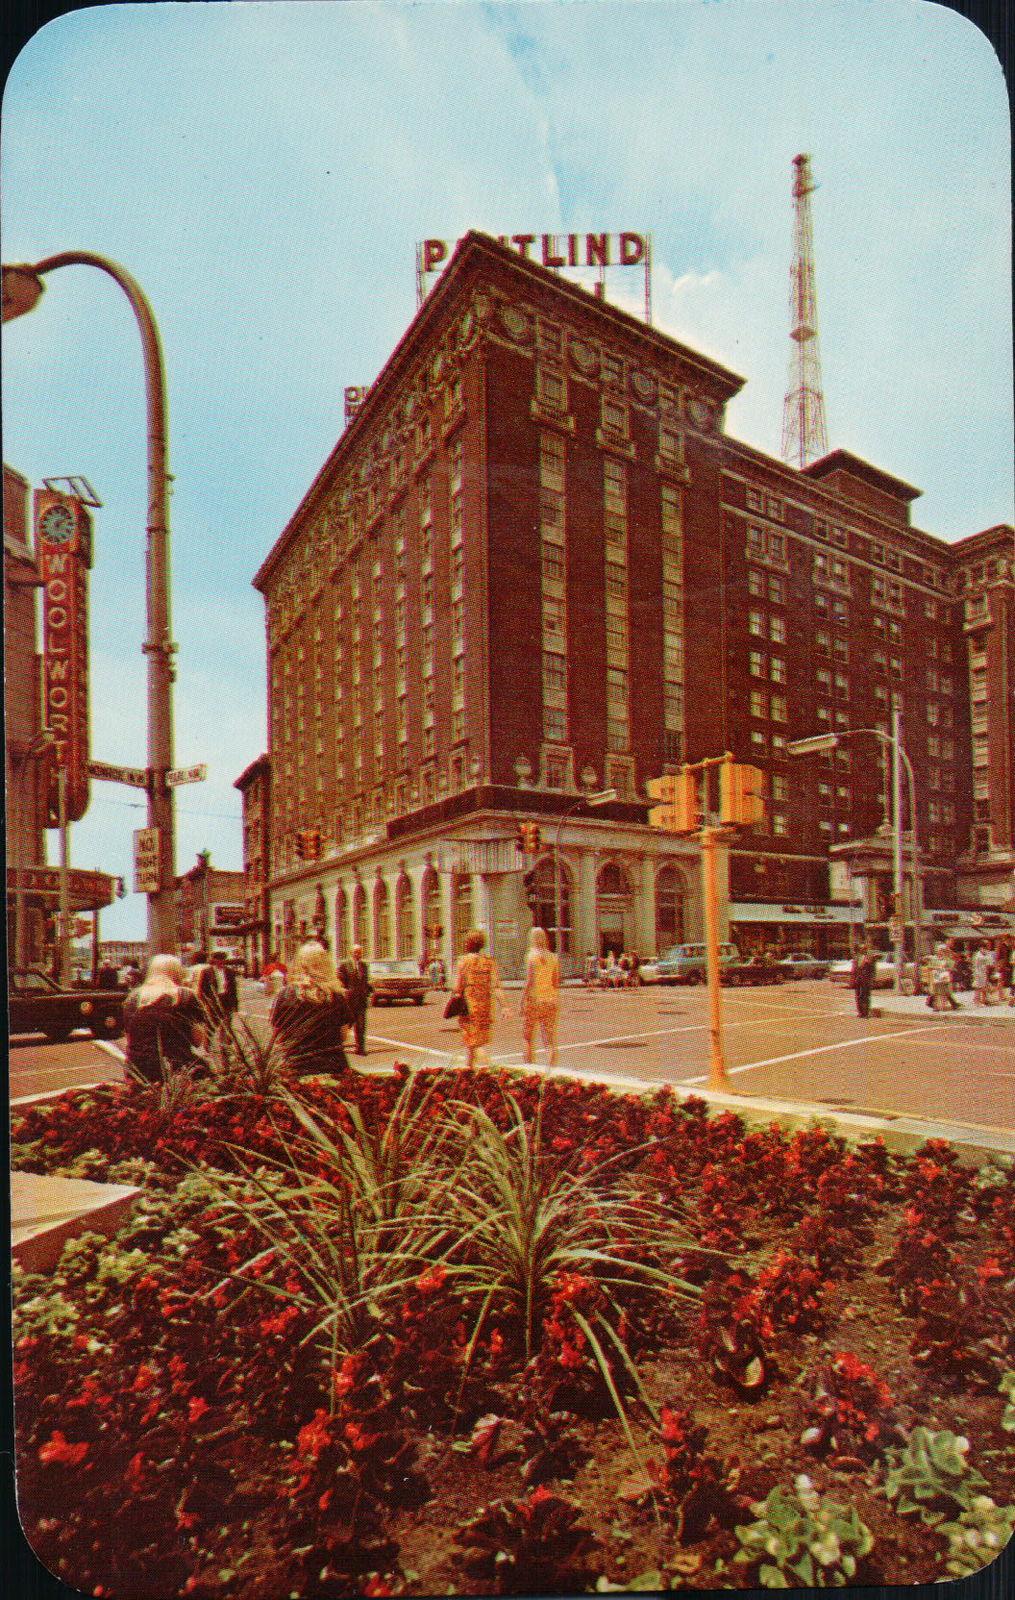 pantlind hotel grand rapids michigan buildings architecture. Black Bedroom Furniture Sets. Home Design Ideas